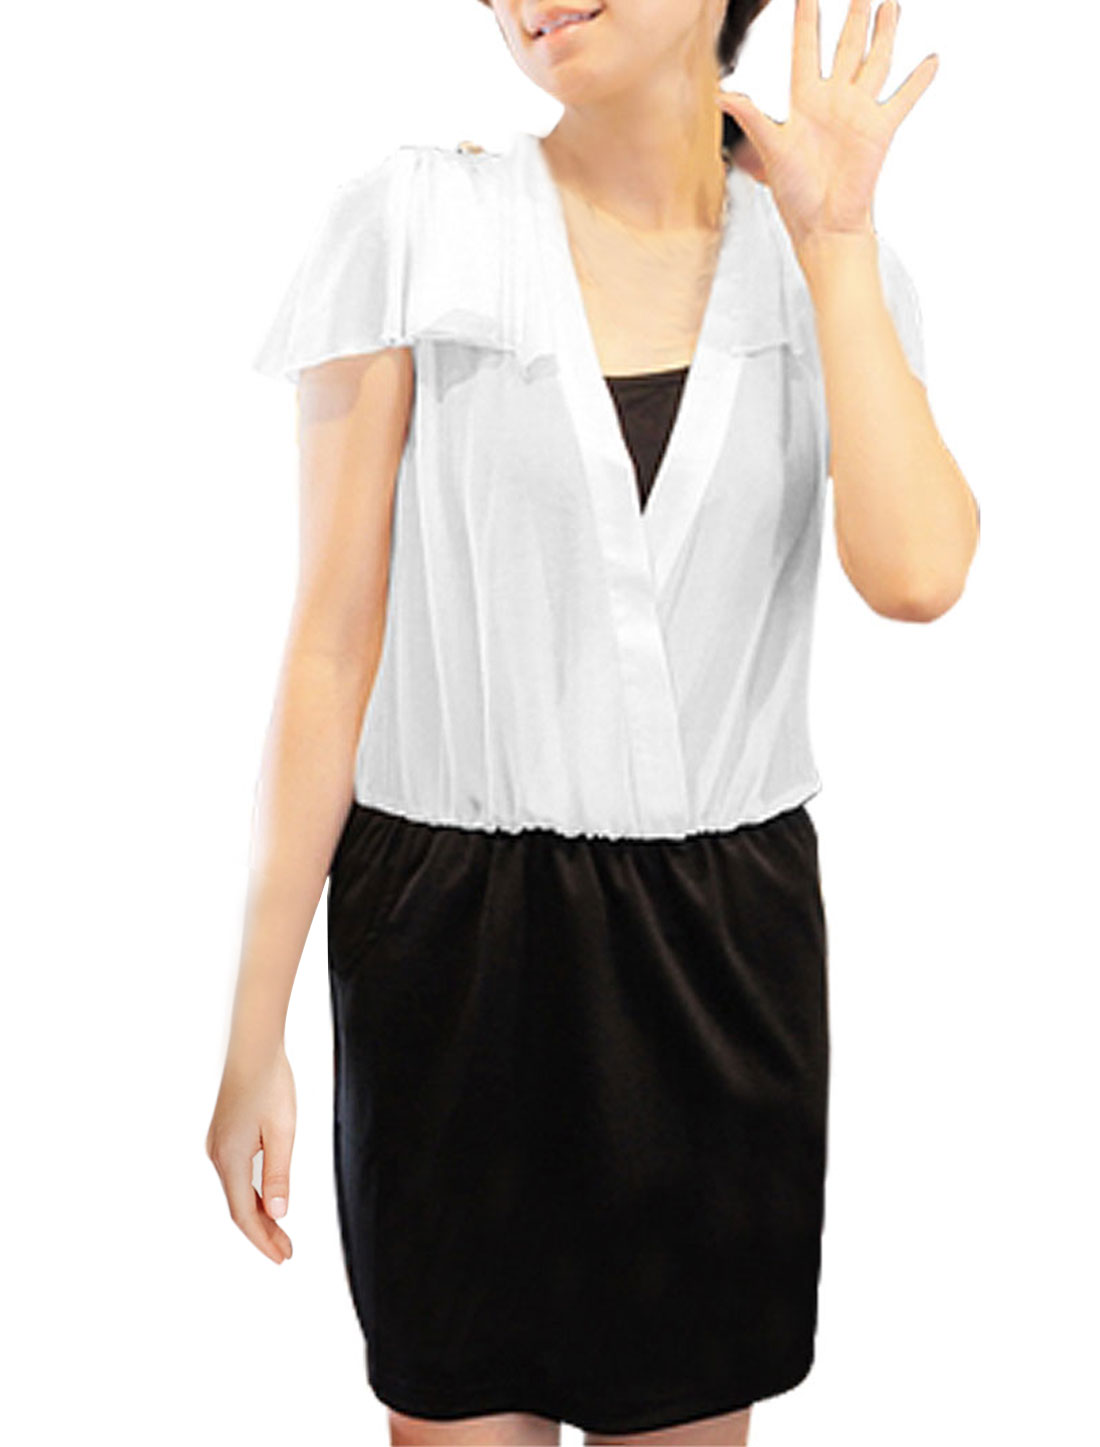 Ladies Black White Deep V Neck Mini Dress XS + Camisole